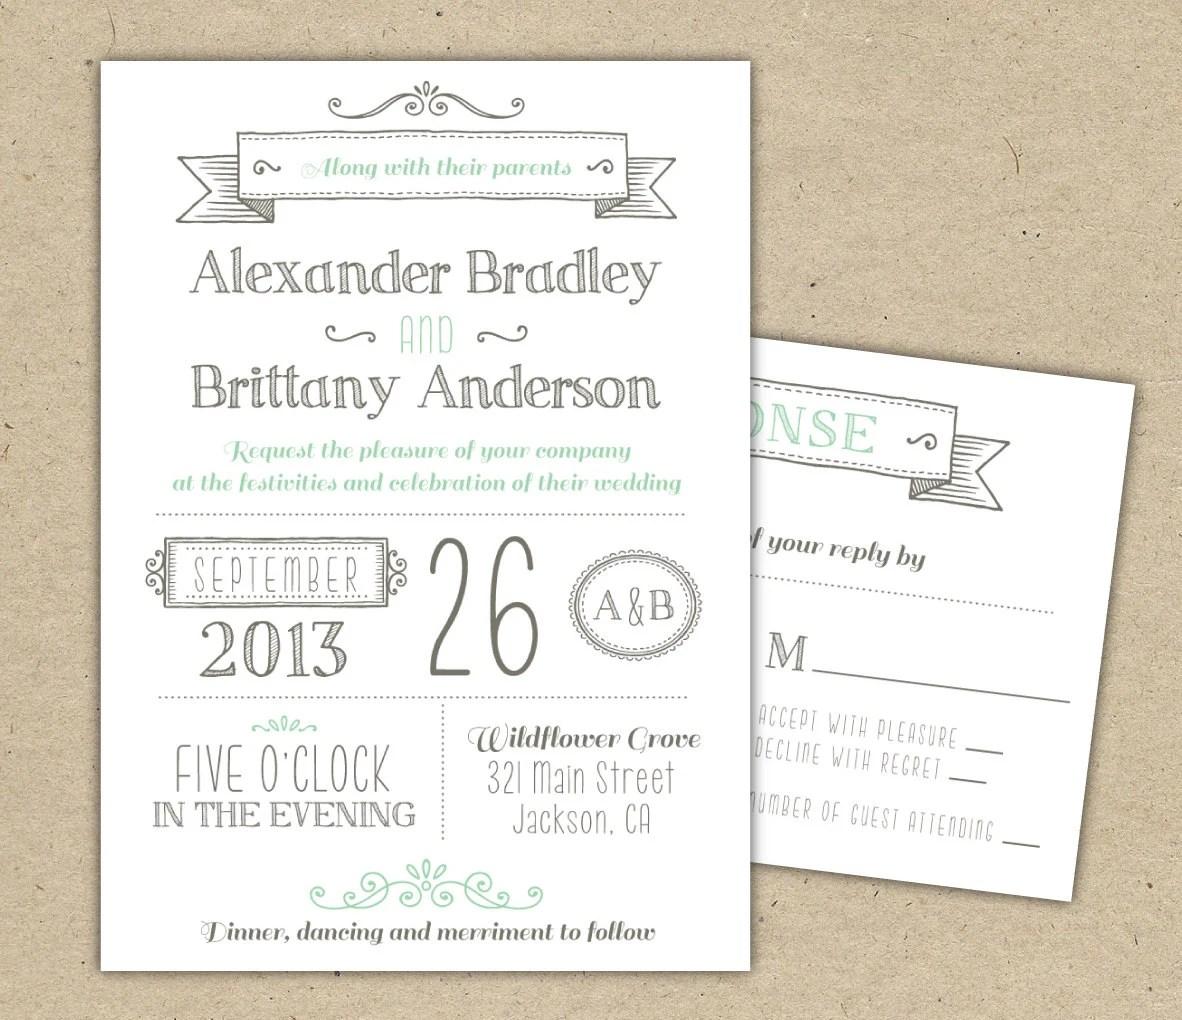 Wedding Invitation 1041 SAMPLE Modern invitation template